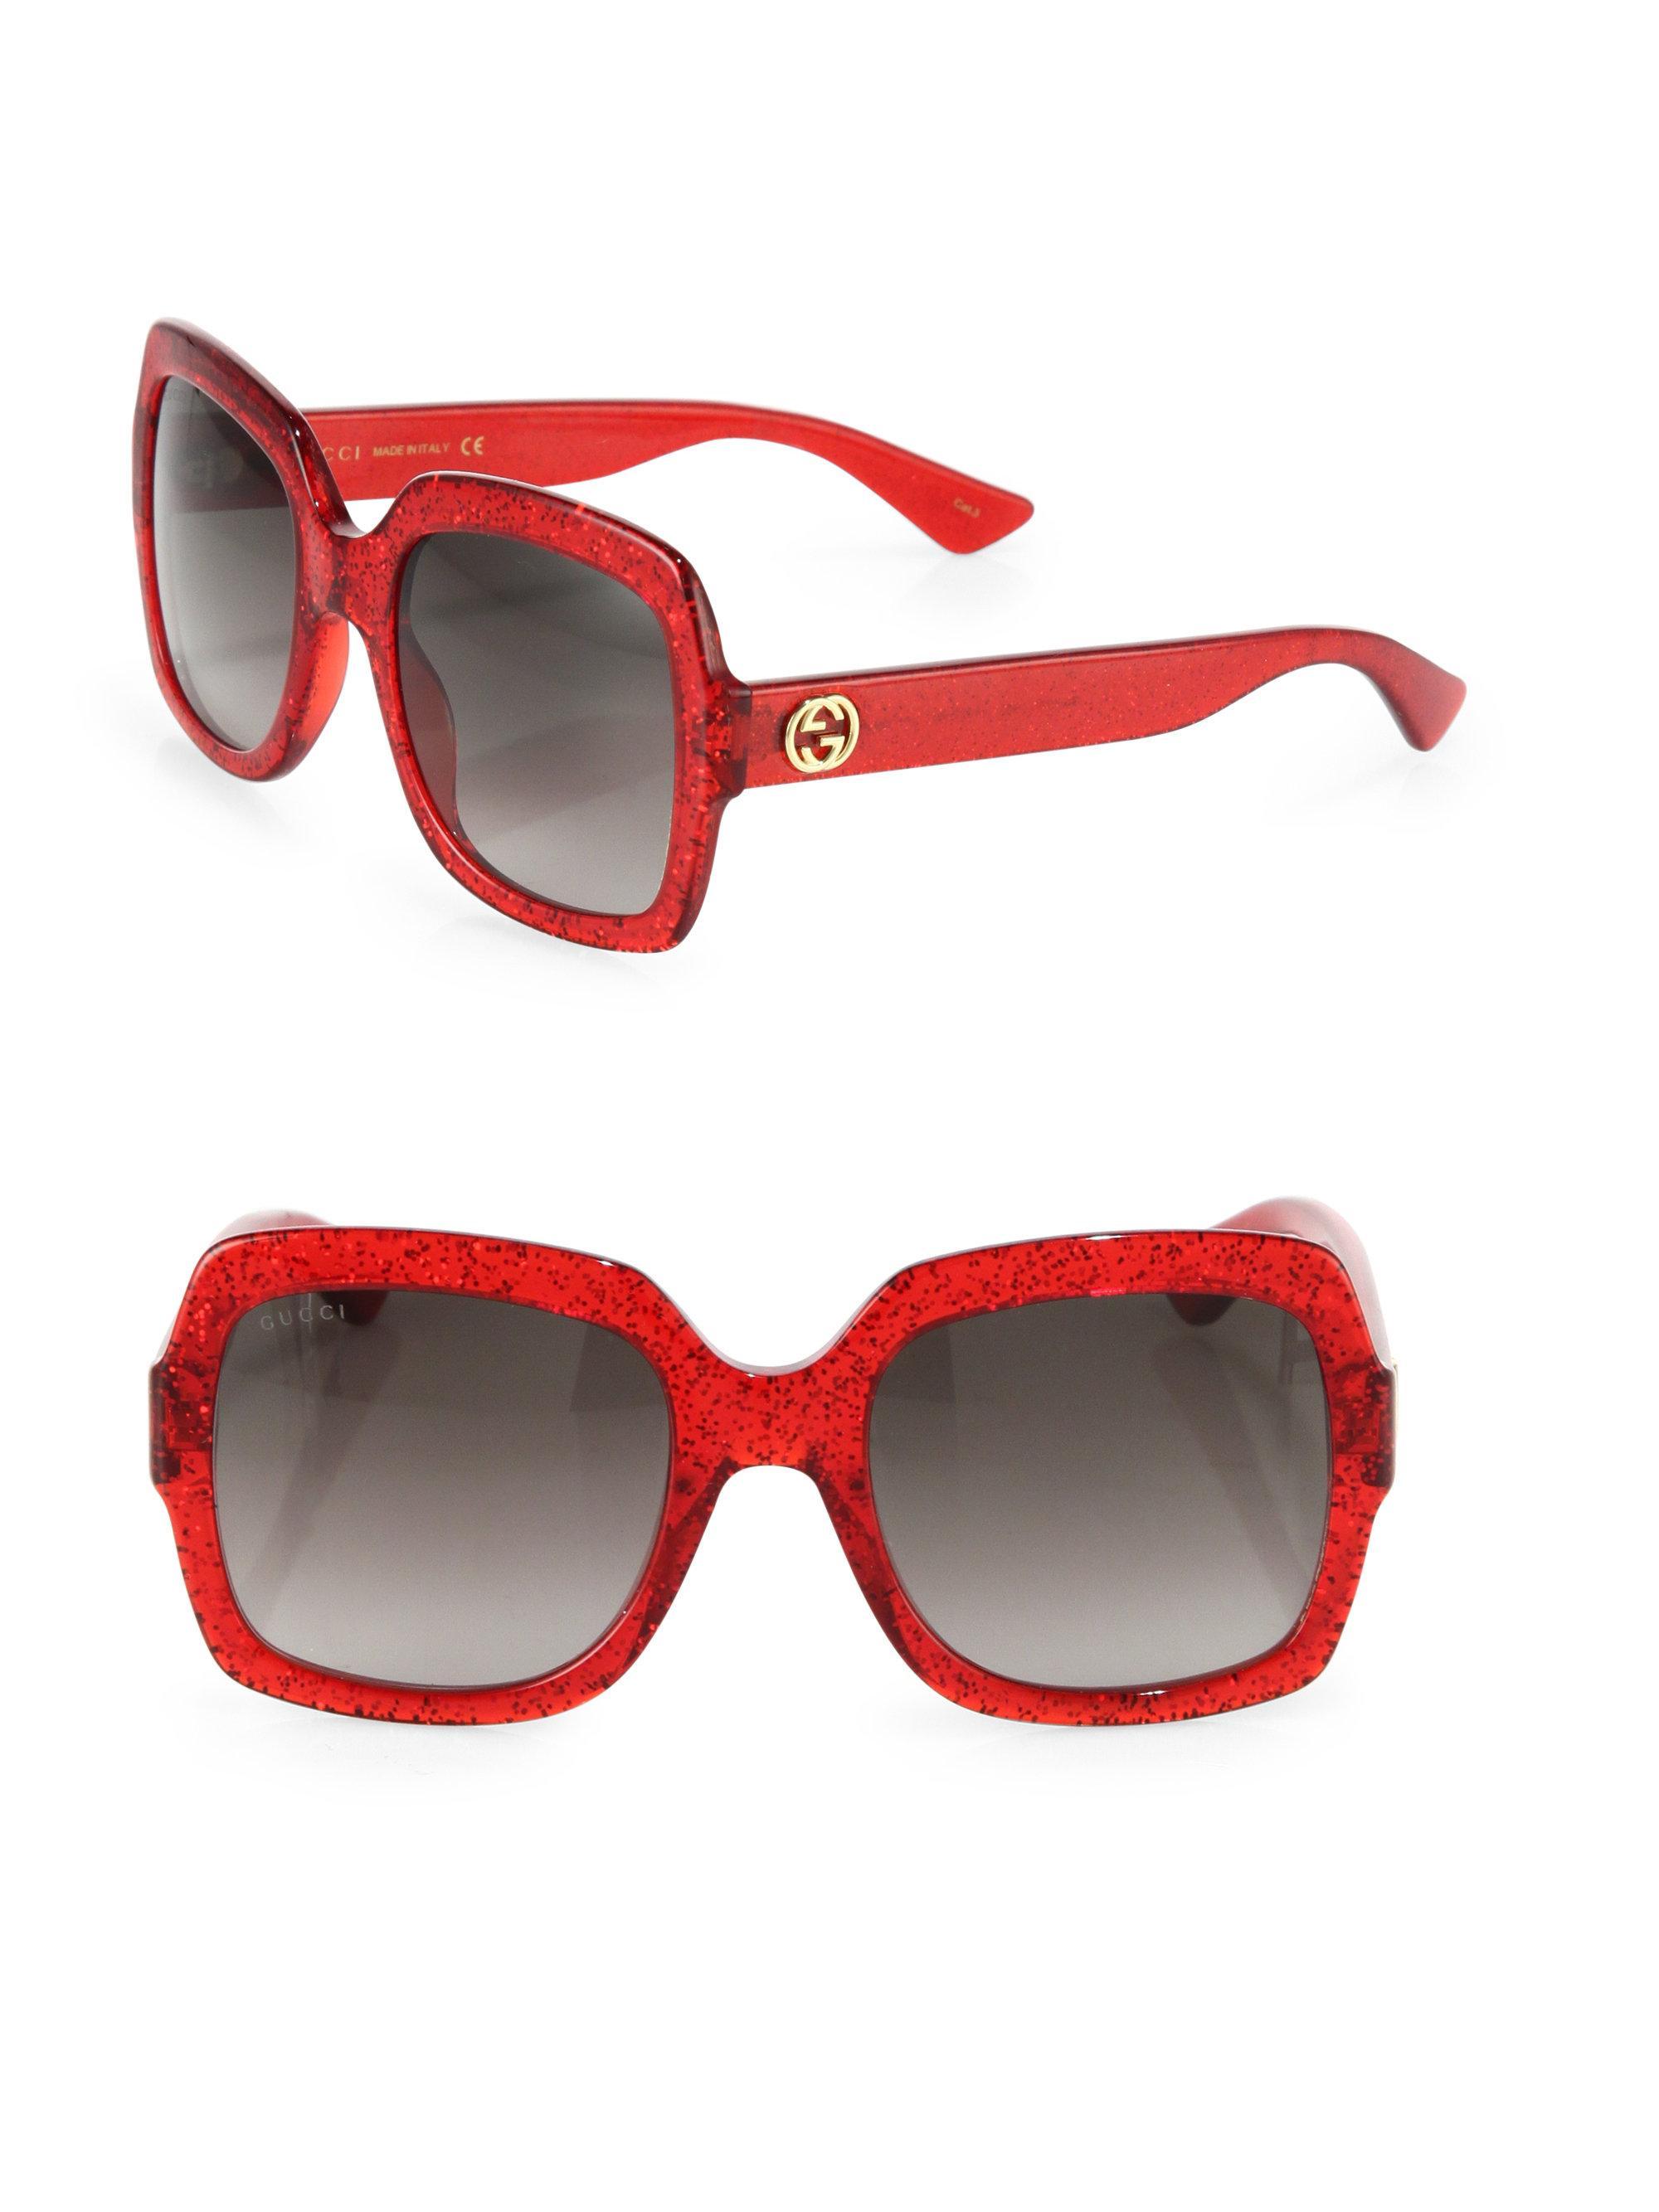 6f9f9a8636 ... Lyst Gucci Women s 54mm Oversized Glitter Square Sunglasses Red